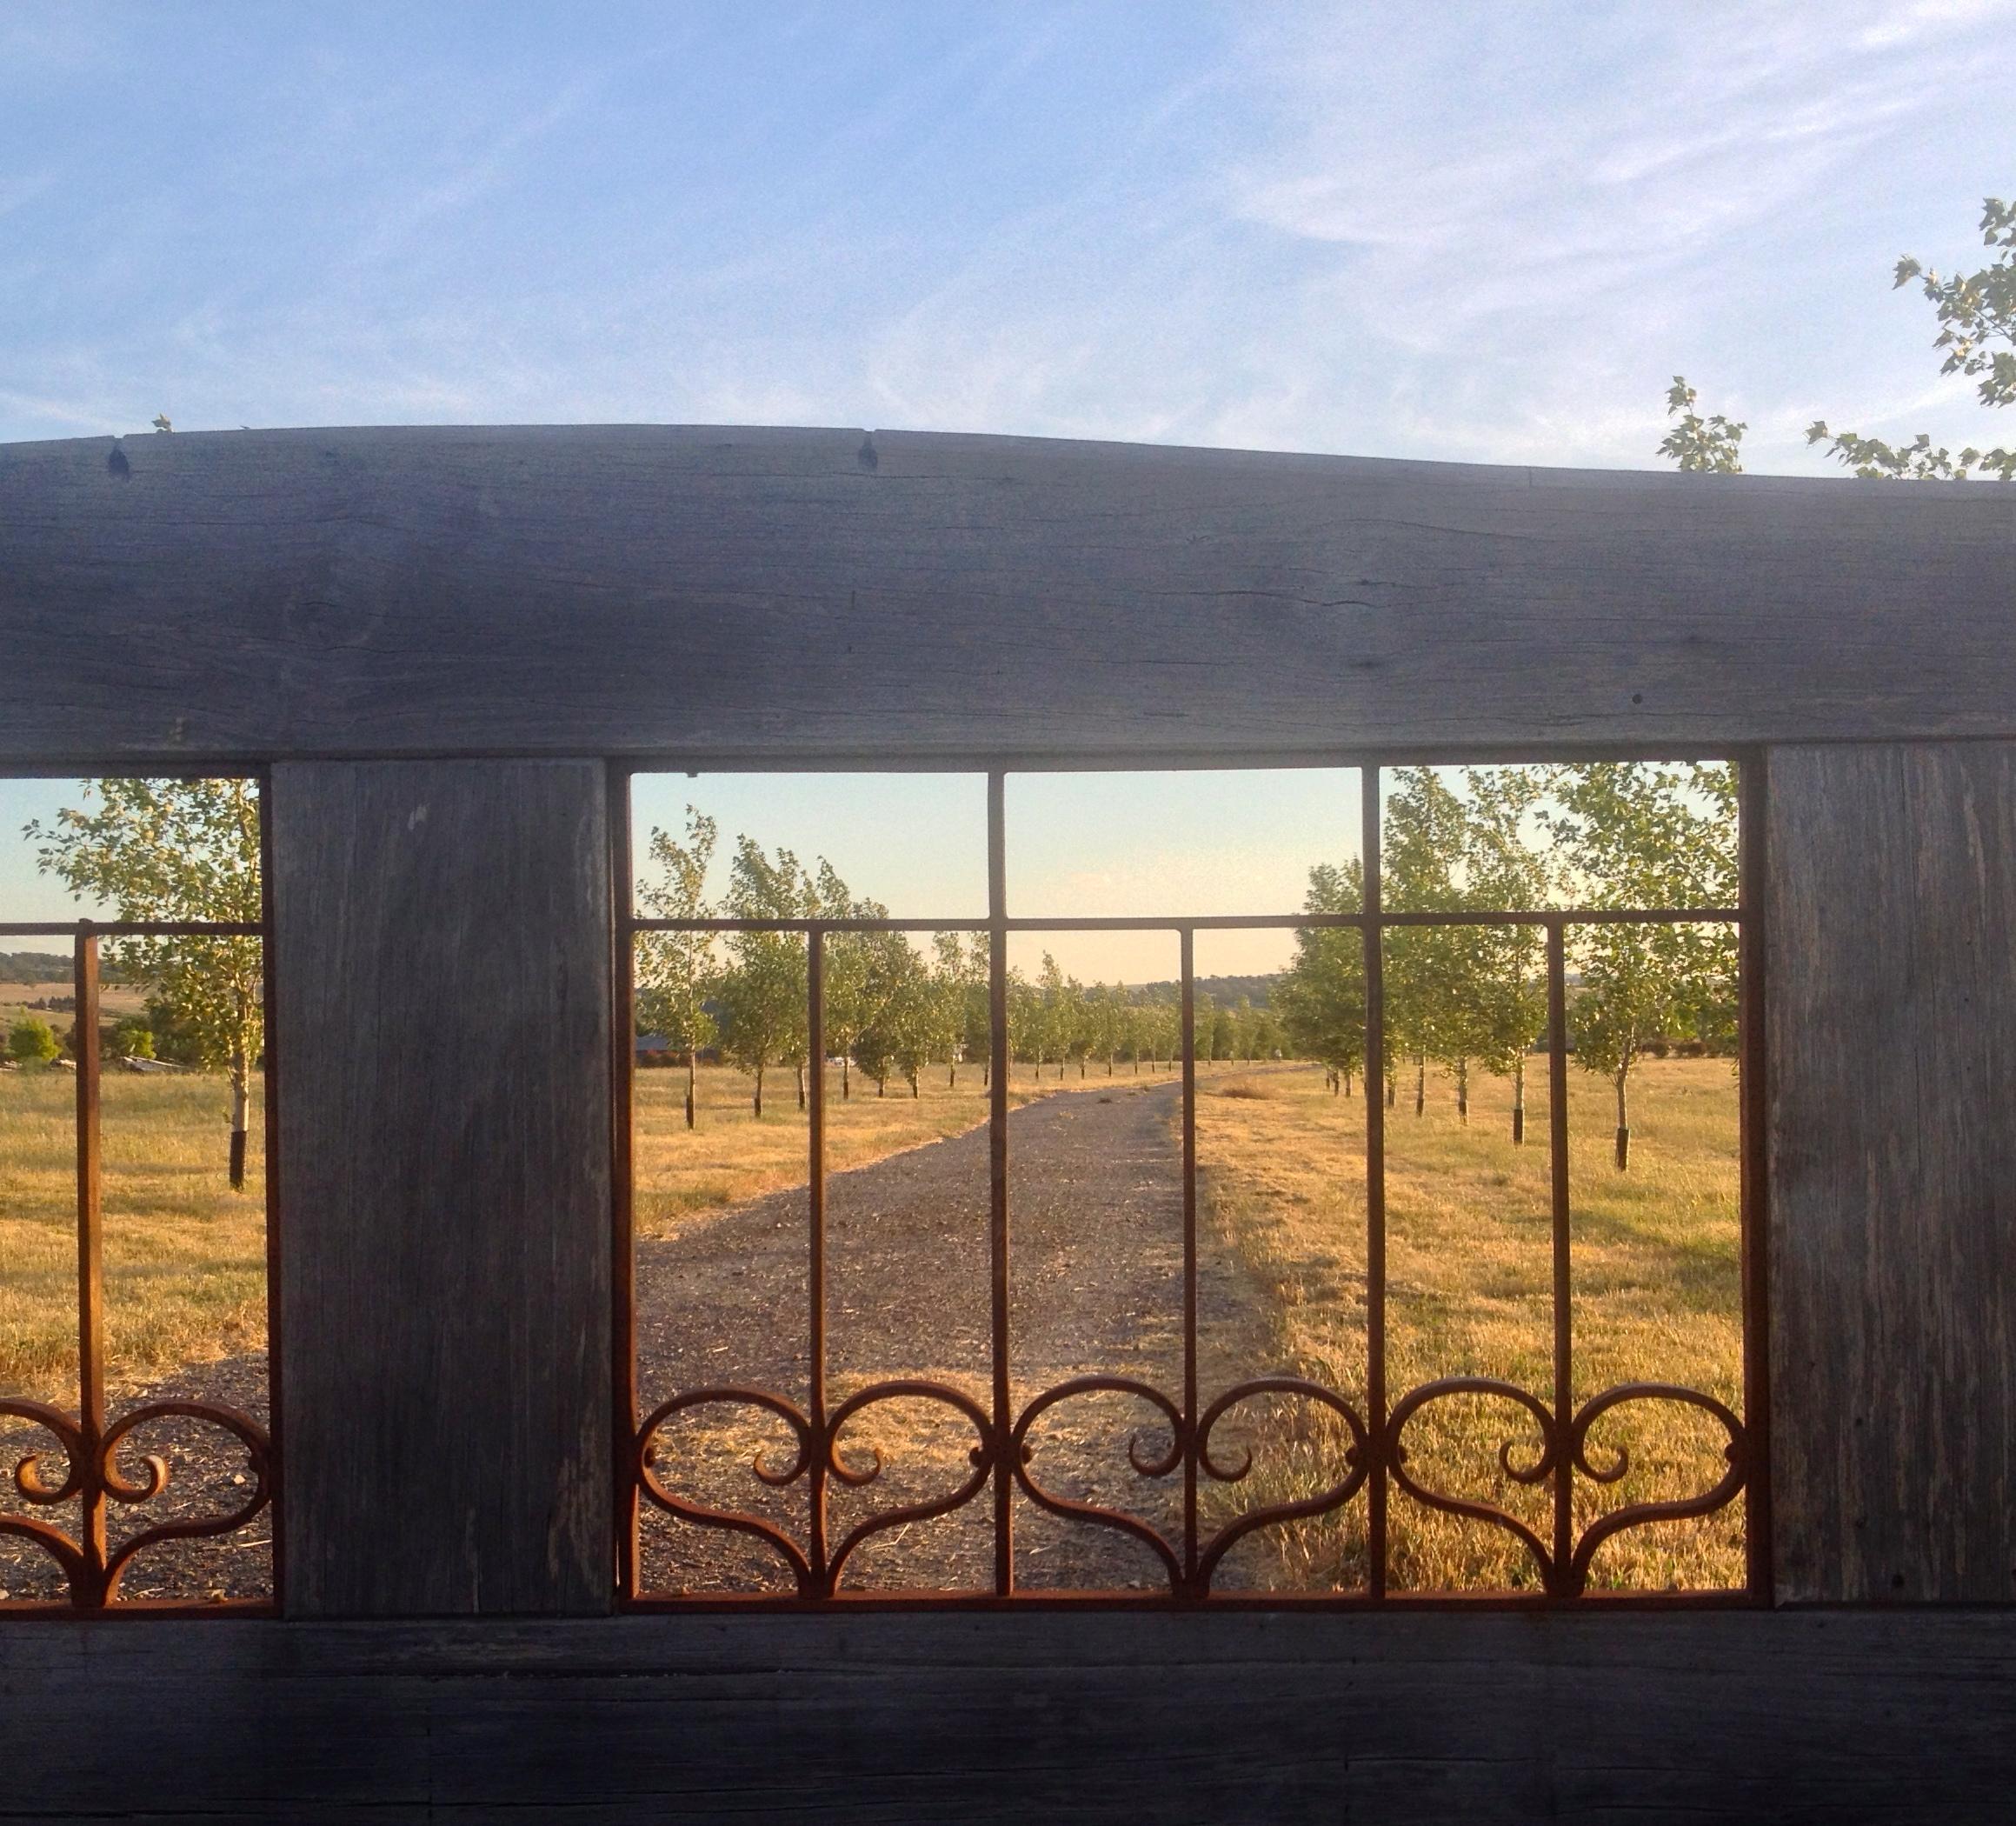 Andrew_Economos_Custom_Builder_Bowral_NSW_Australia_Custom_Doors_and_Floors_4.jpg